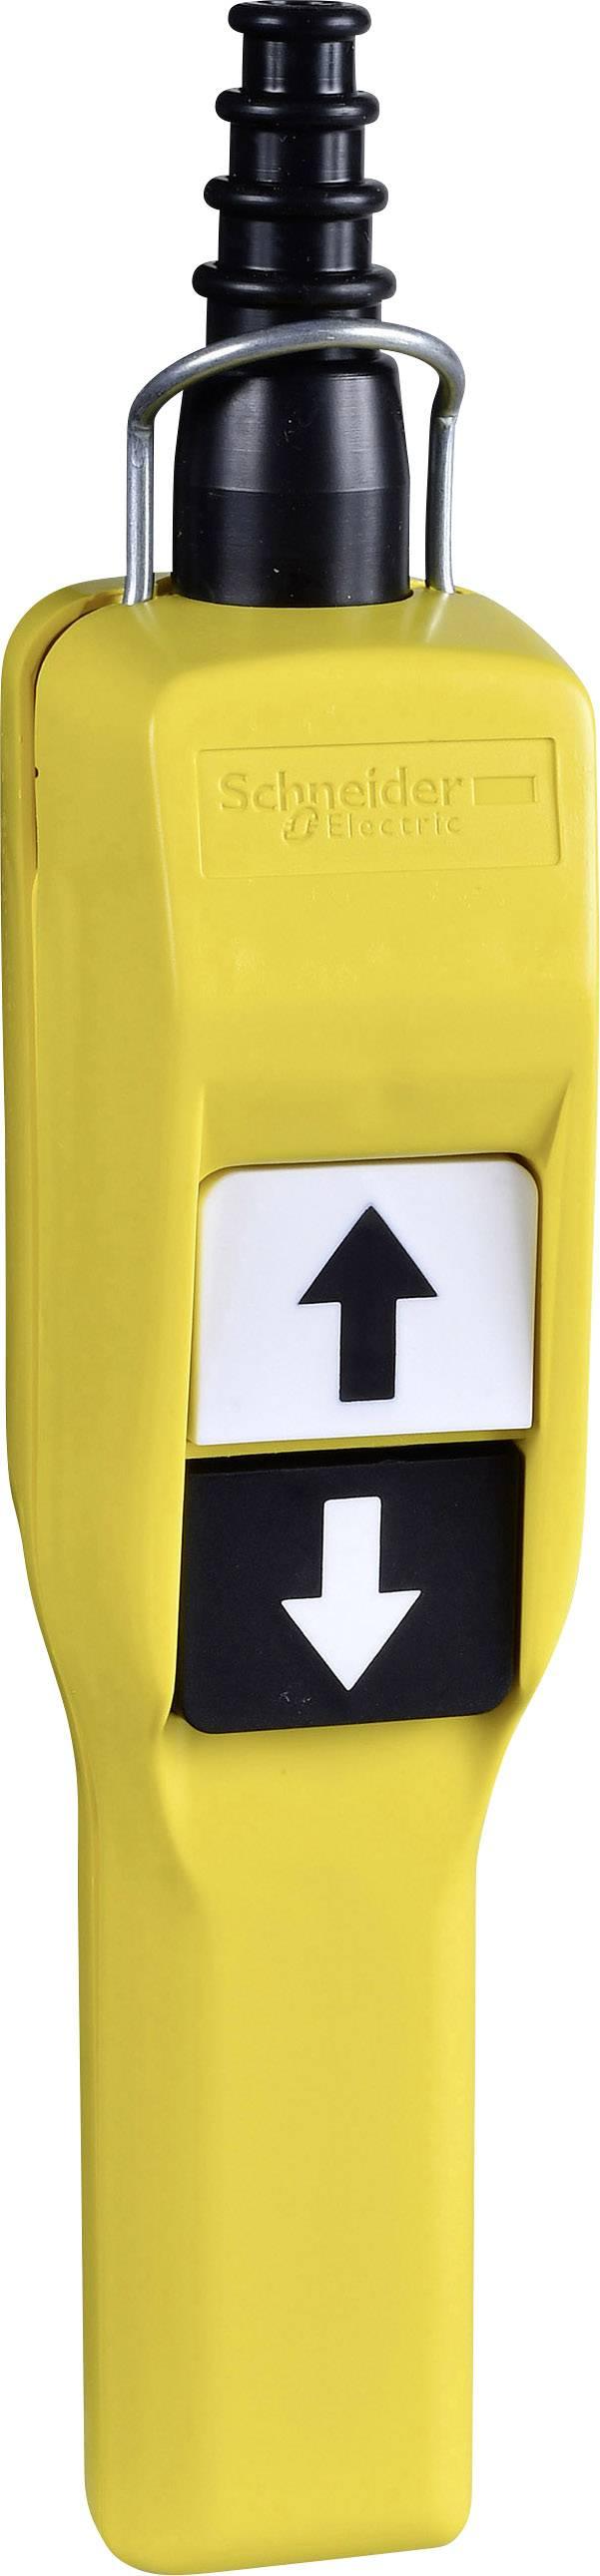 Závěsné tlačítko Schneider Electric XACA201, žlutá, 1 ks